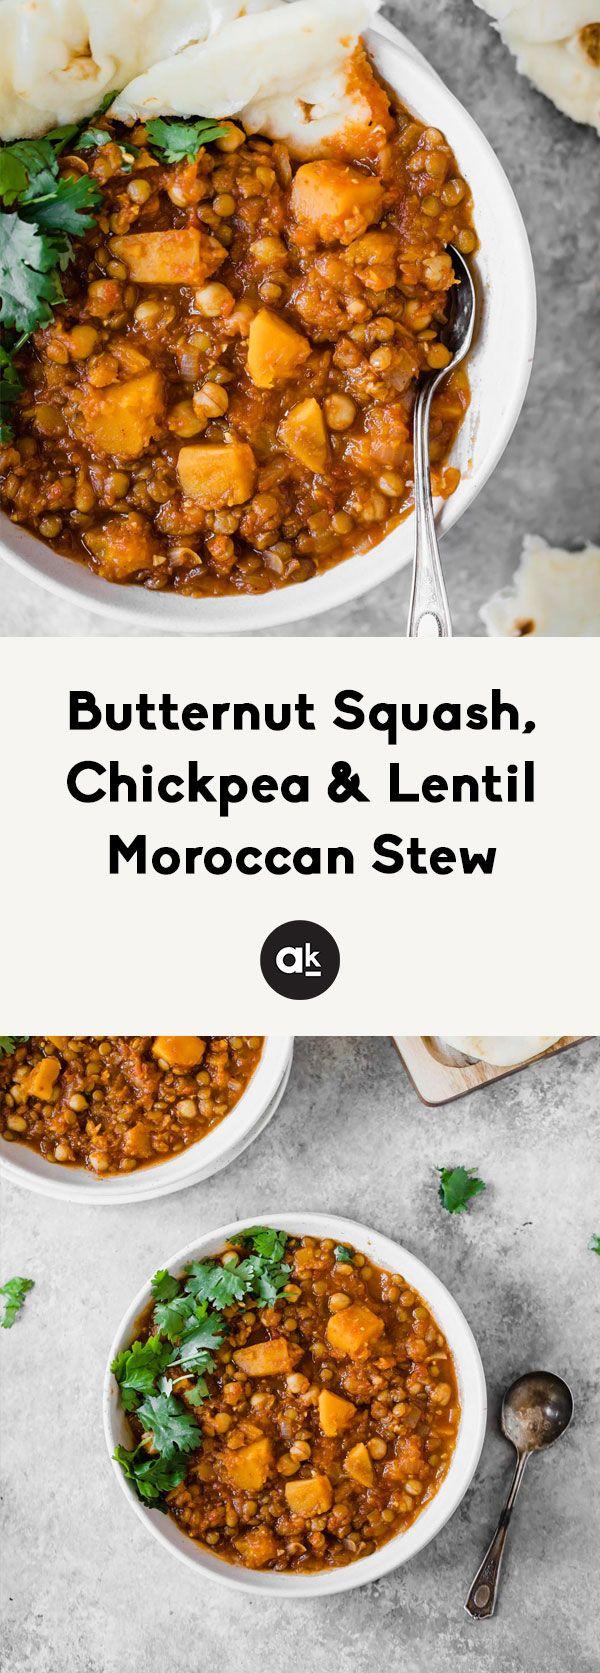 Butternut Squash, Chickpea & Lentil Moroccan Stew